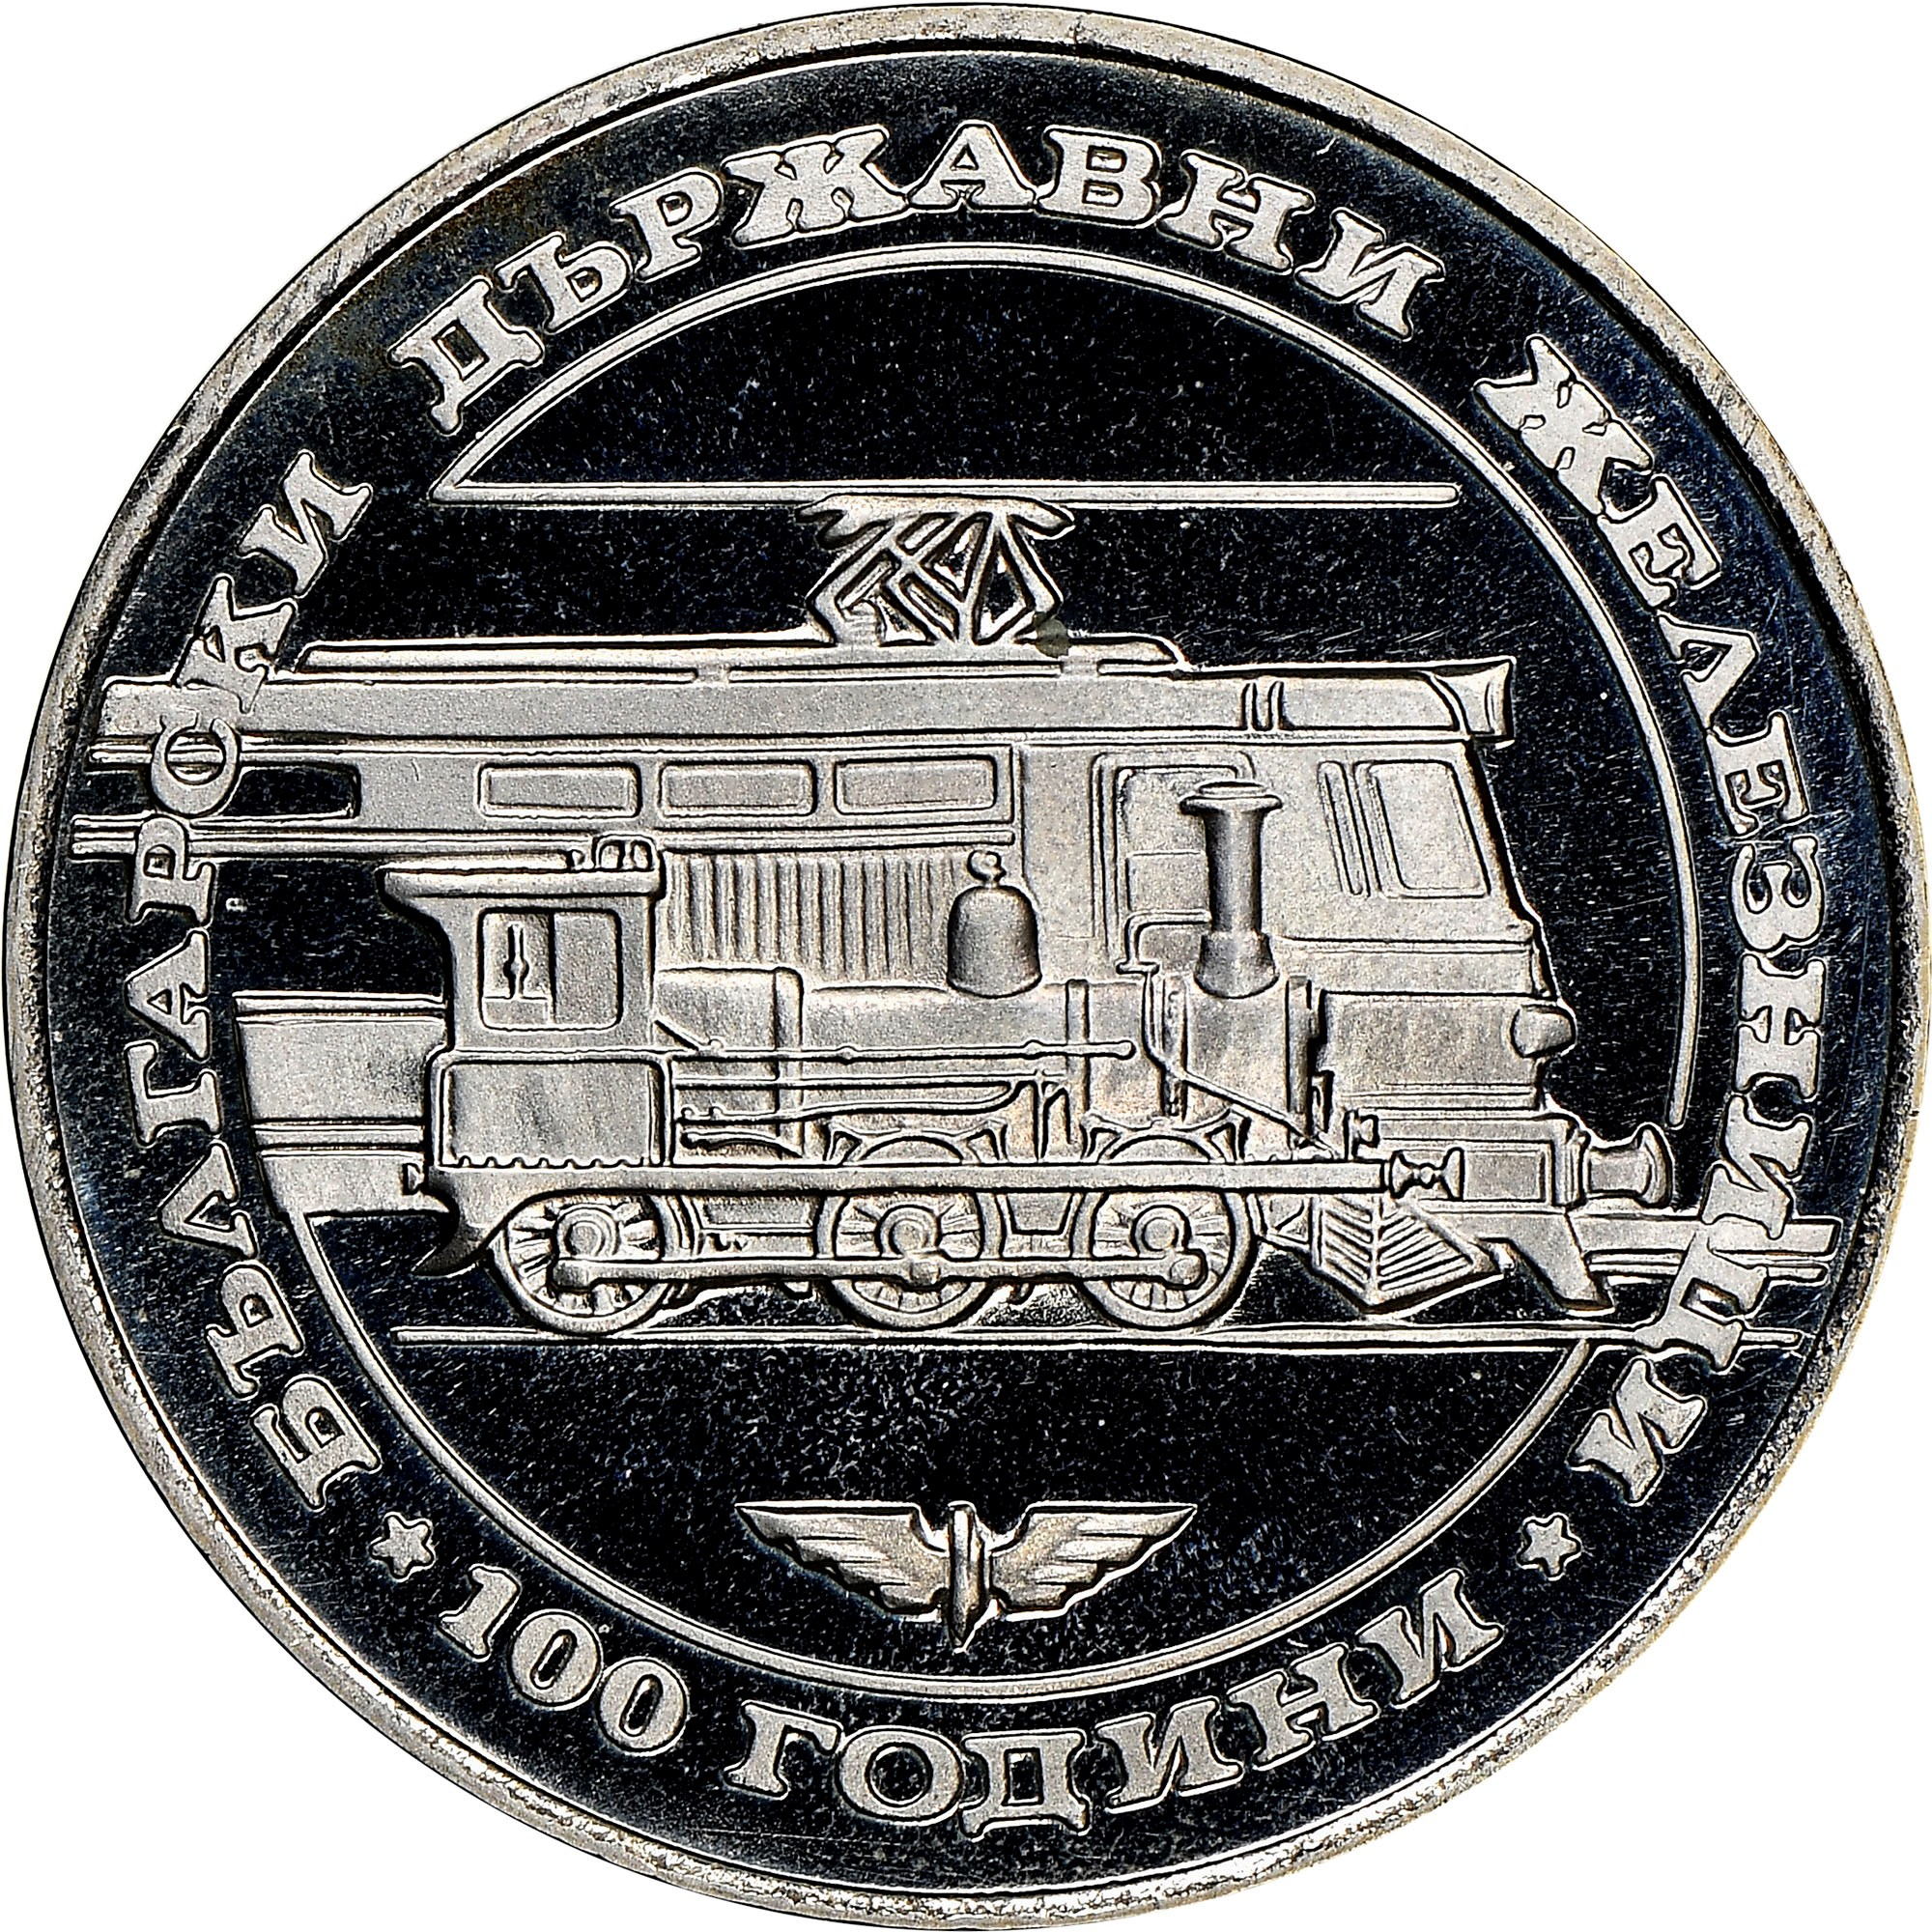 Bulgaria 20 Leva reverse